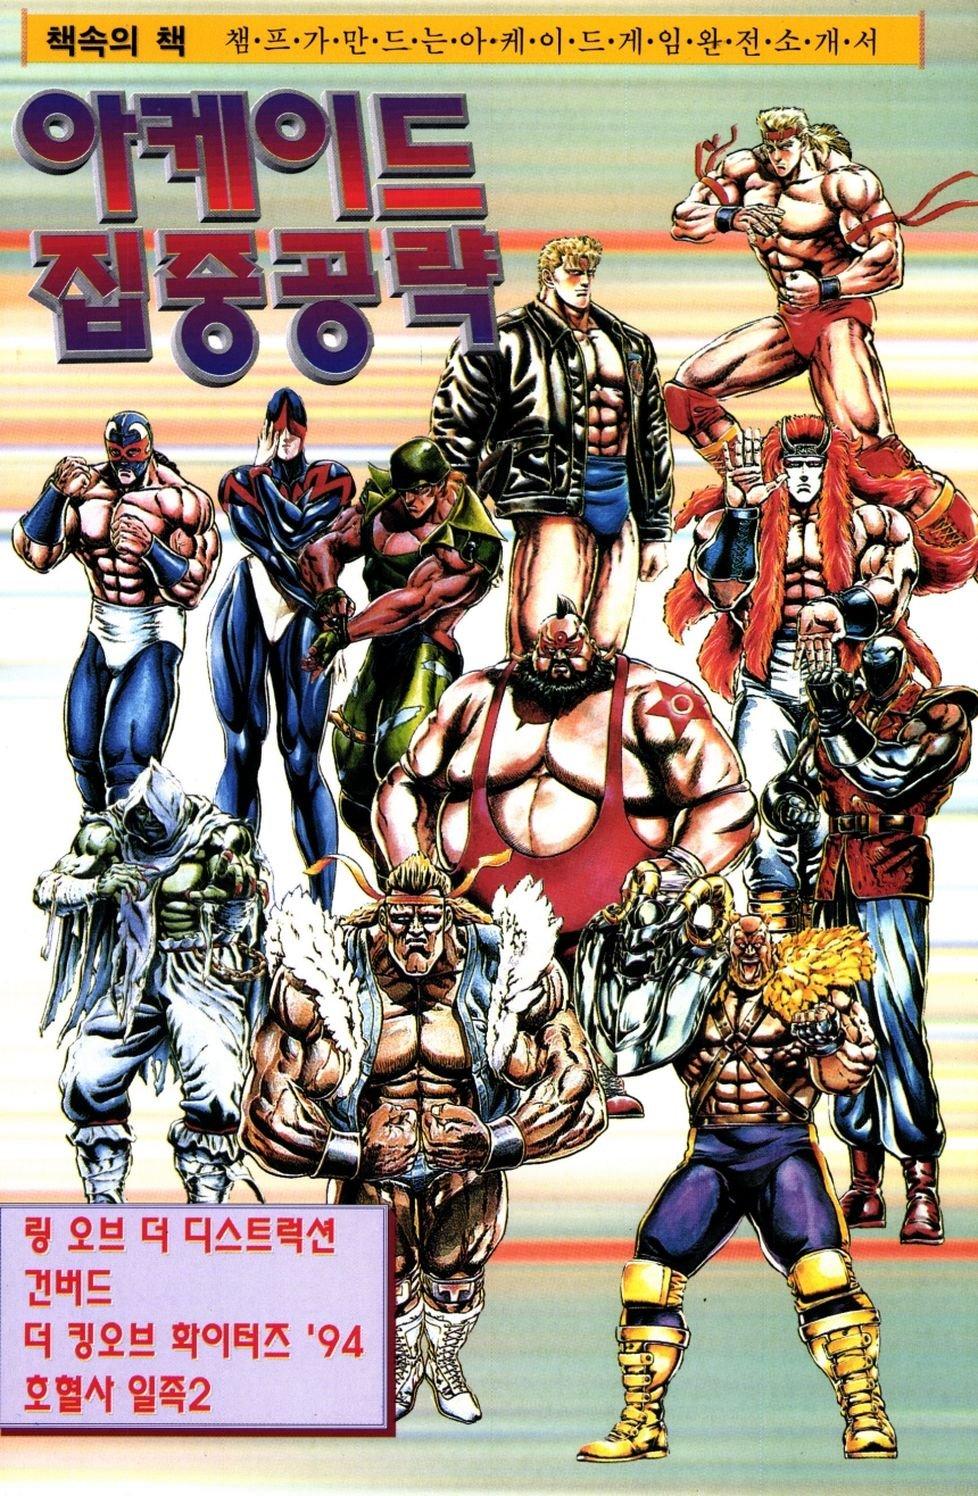 Game Champ Issue 024 supplement 2 (November 1994)